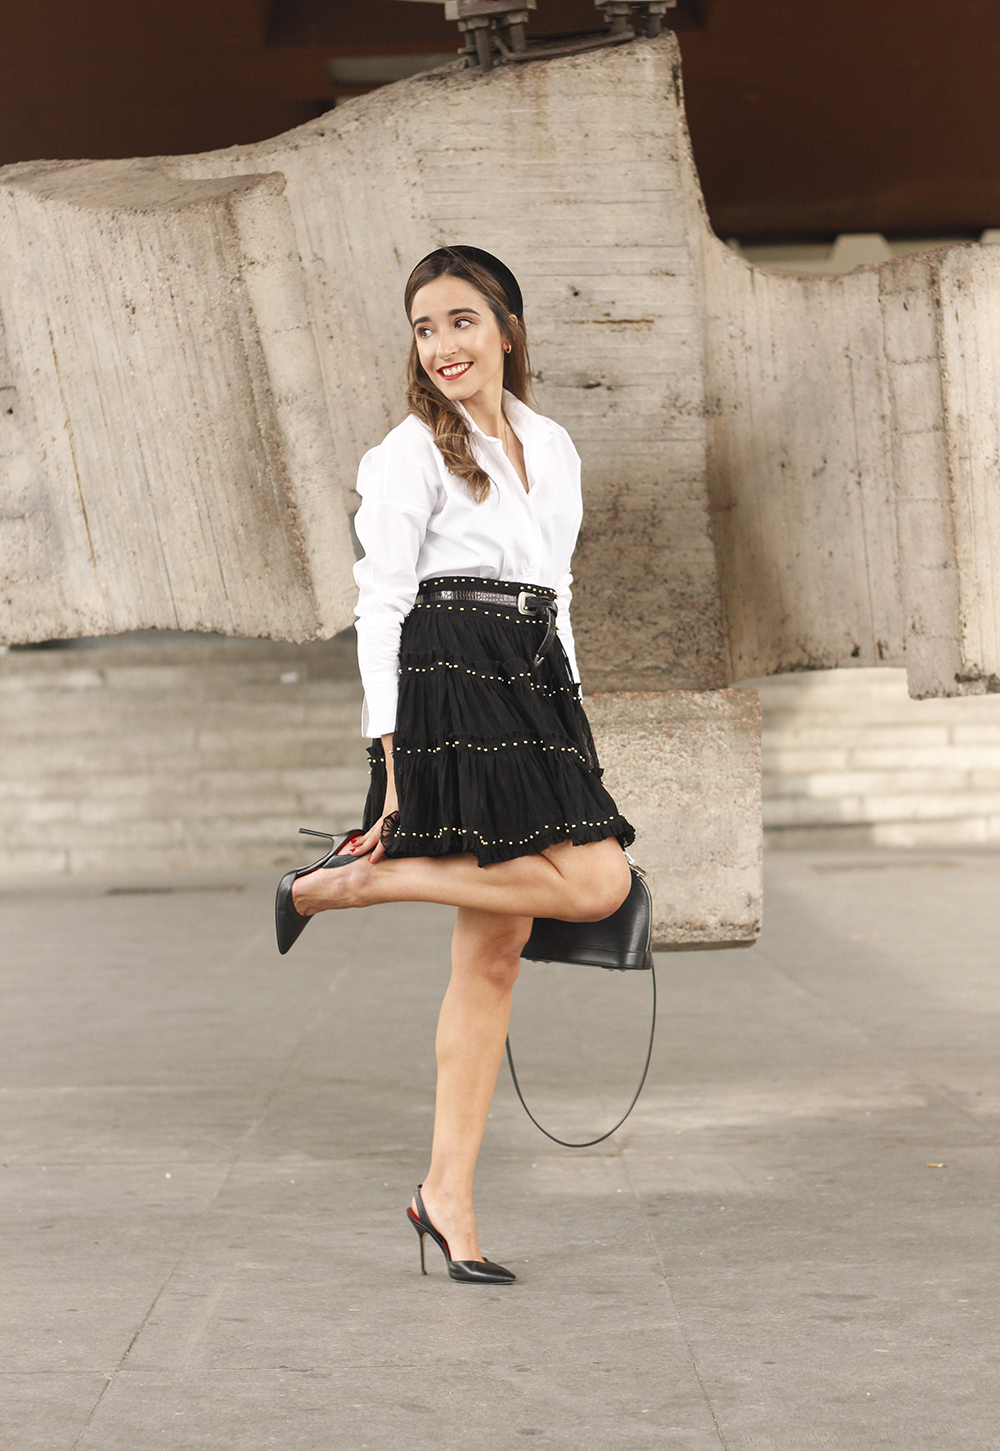 bandeau haut preppy falda negra louis vuitton sac style de la rue tenue6